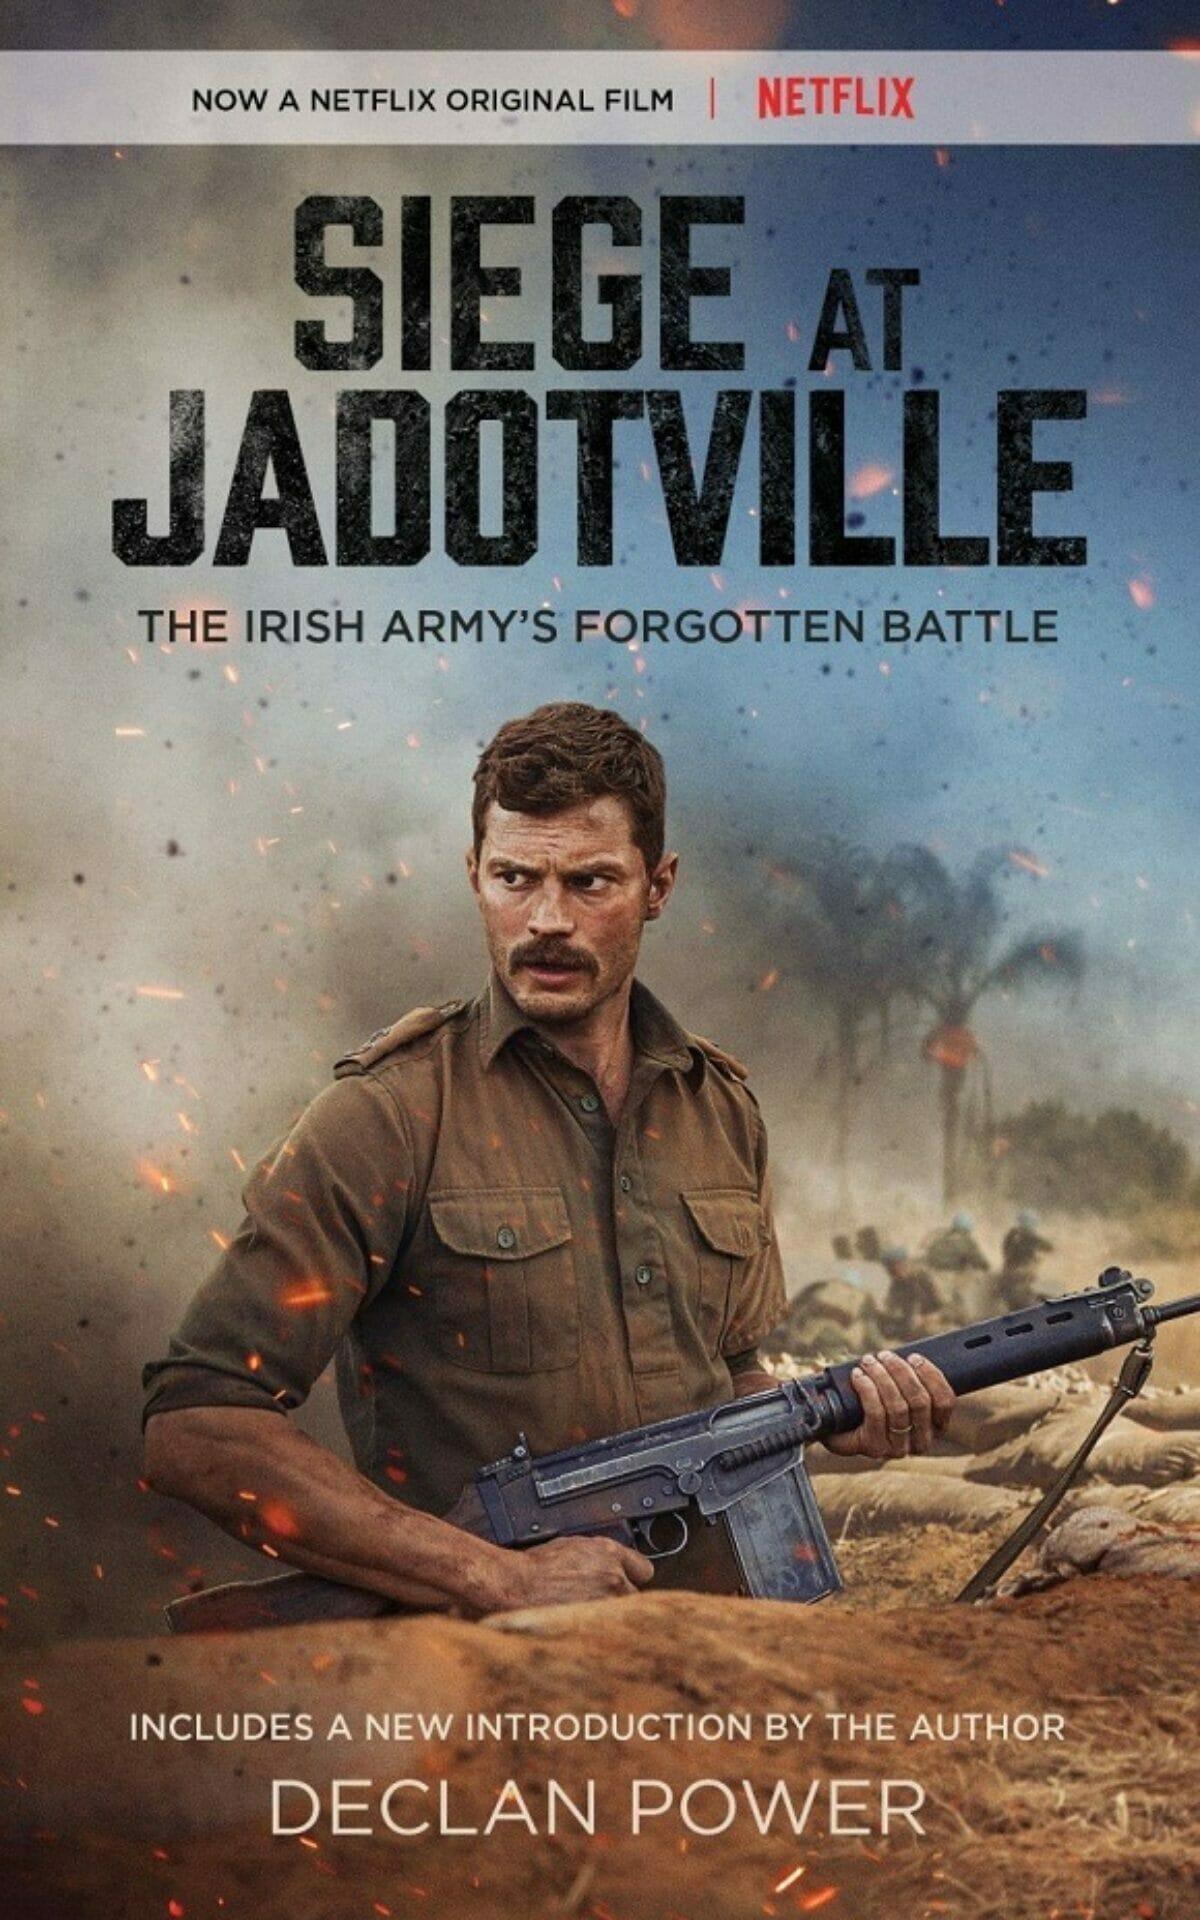 the-siege-of-jadotville-poster